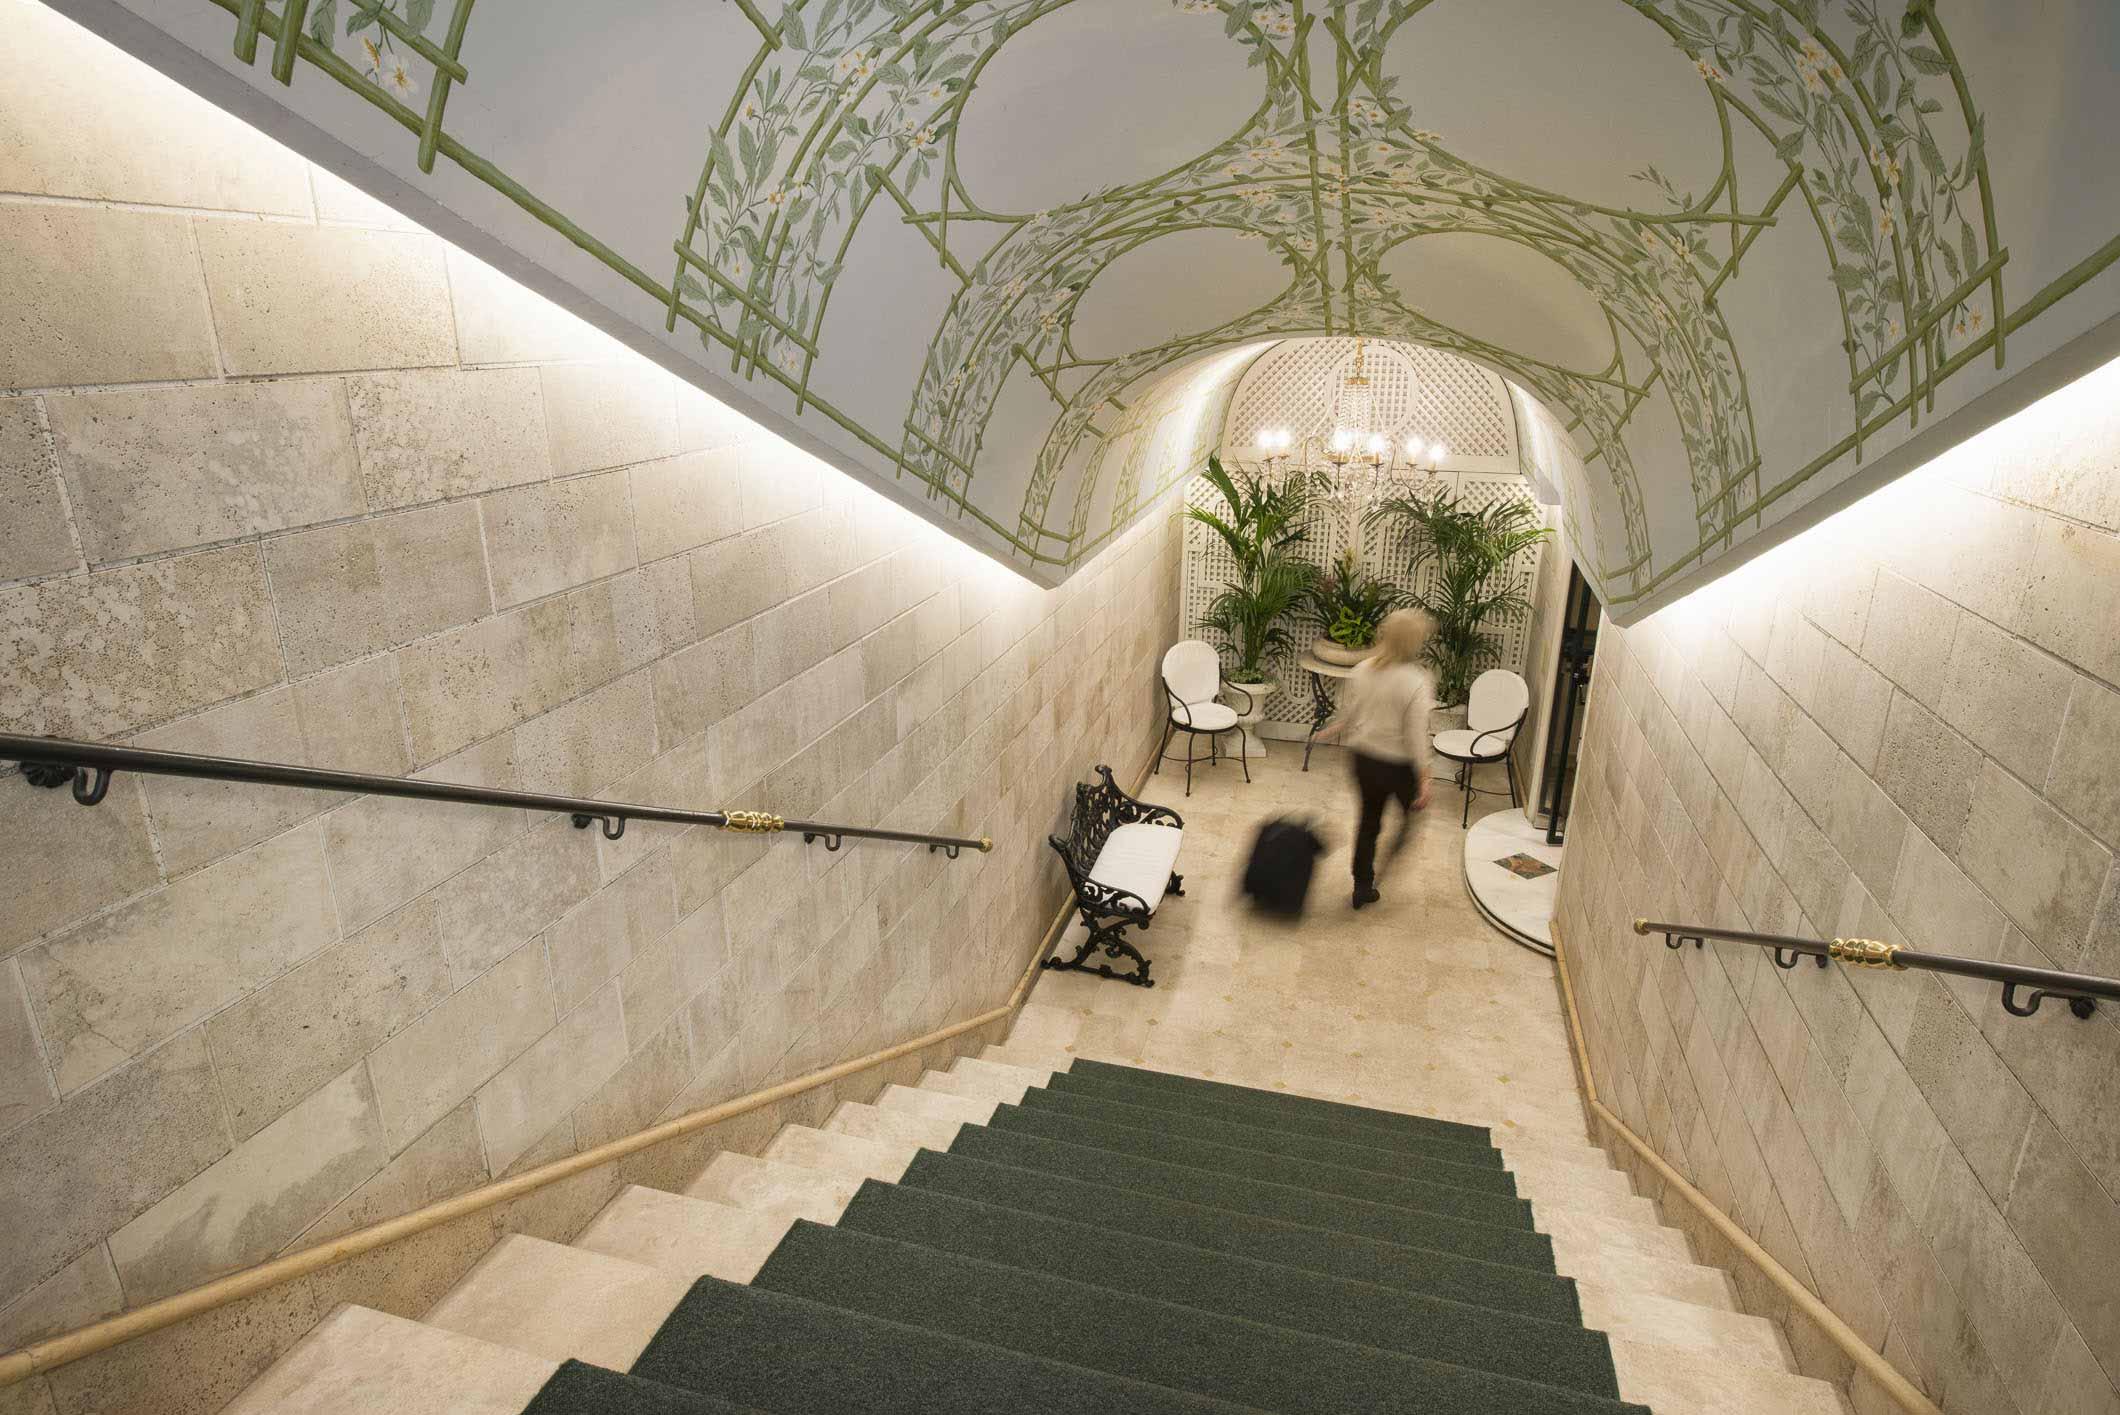 Fotografo per hotel a Roma – Atlante Garden #02